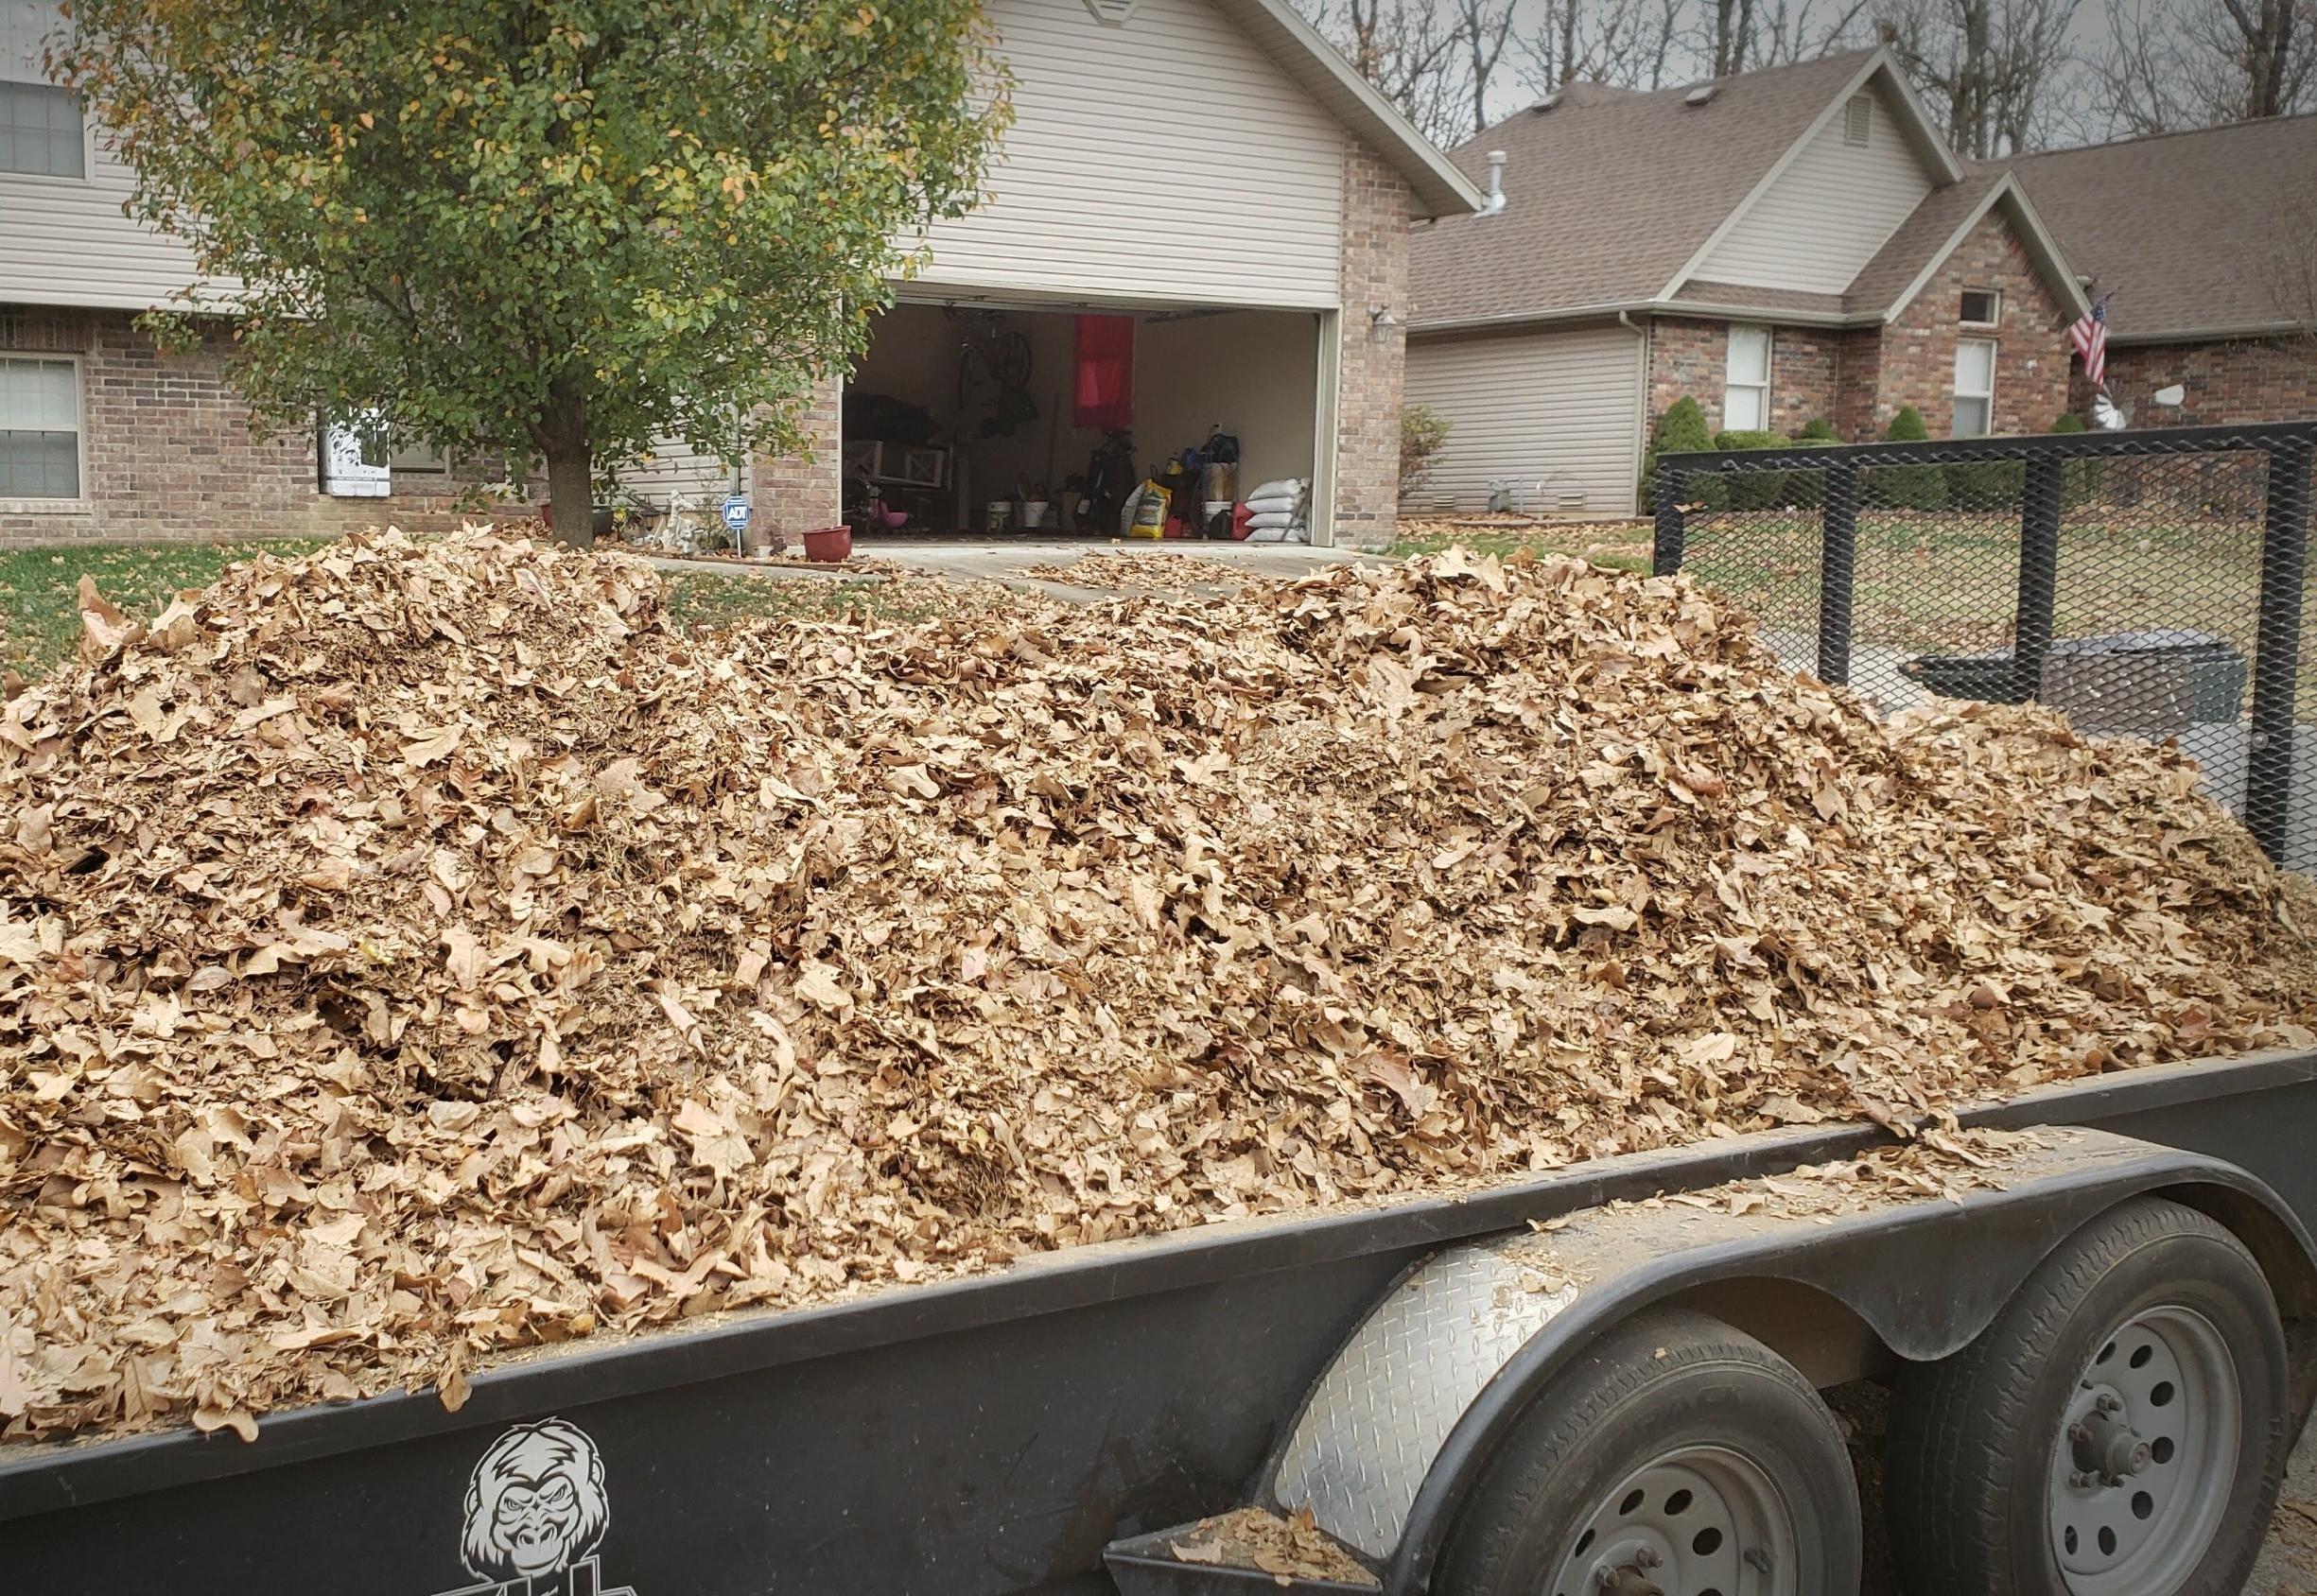 Lawn/Tree Debris Removal & Hauling